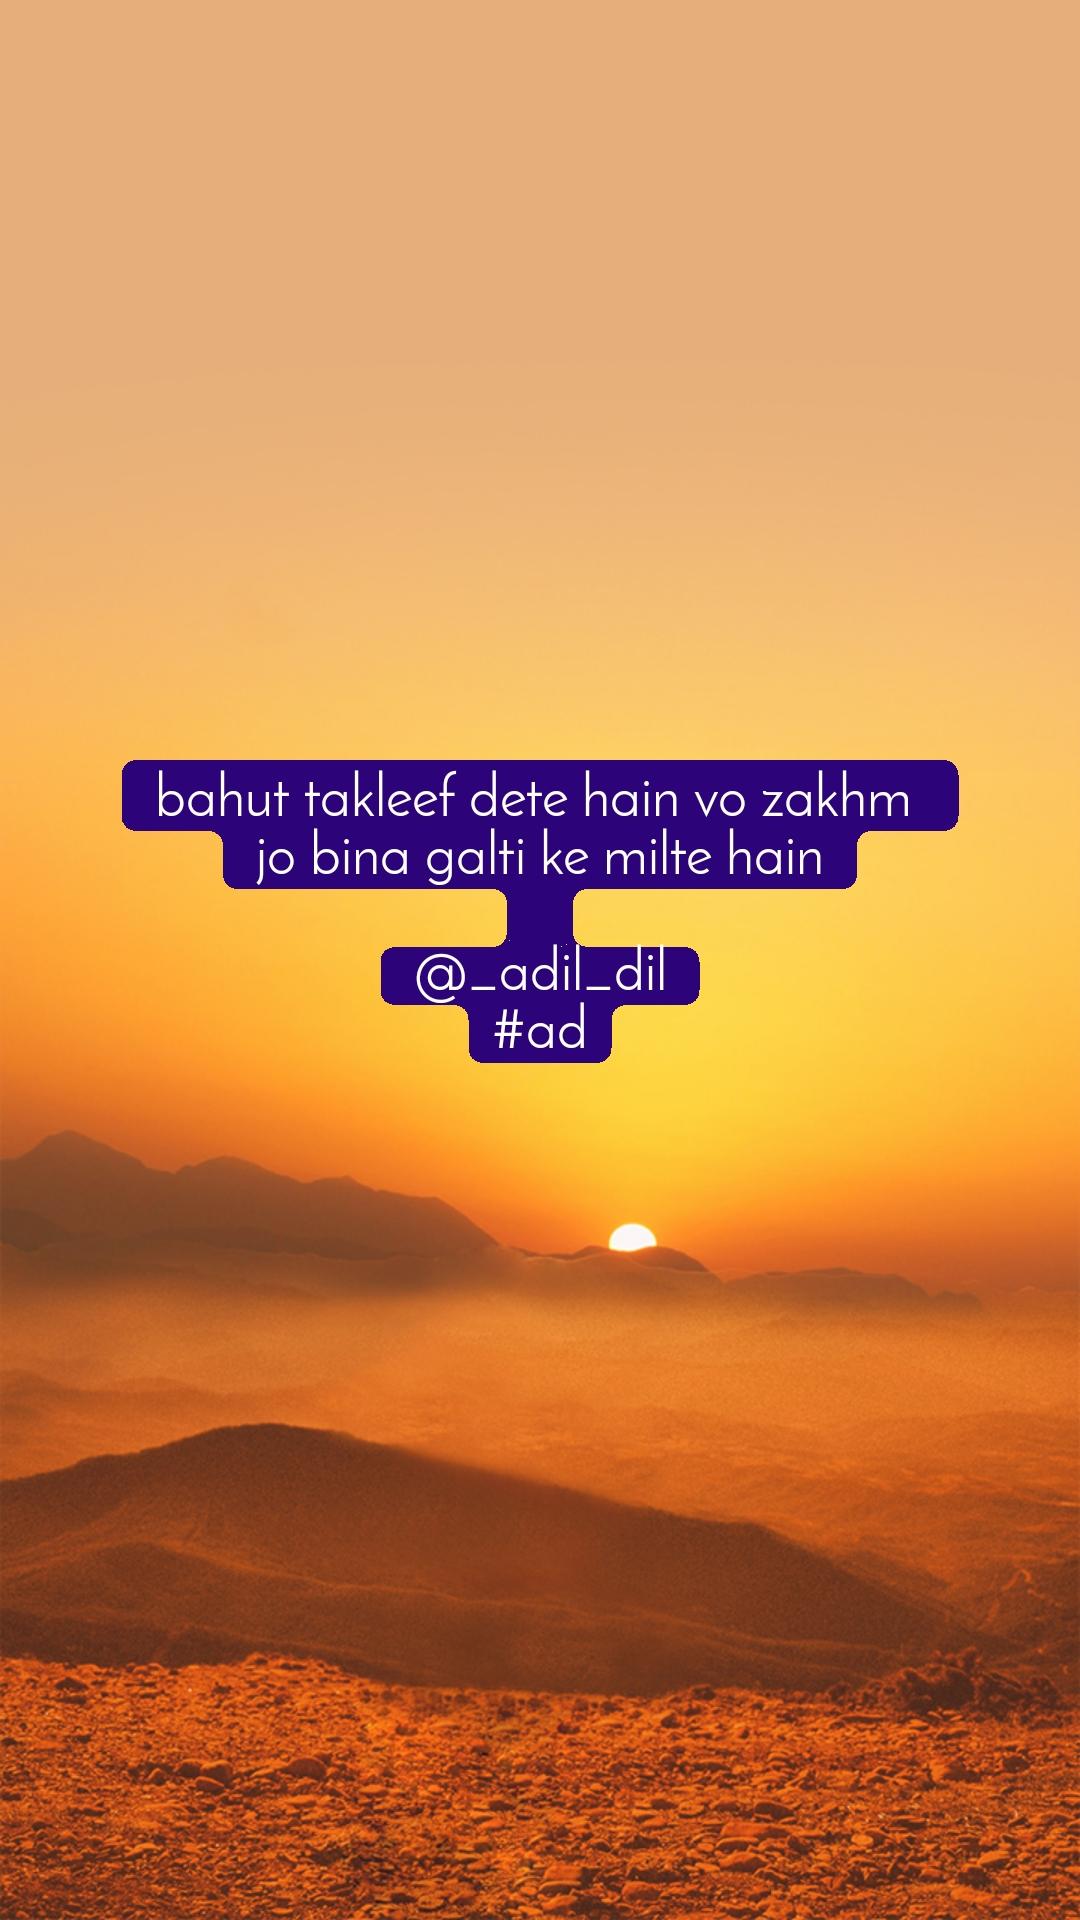 bahut takleef dete hain vo zakhm  jo bina galti ke milte hain  @_adil_dil #ad